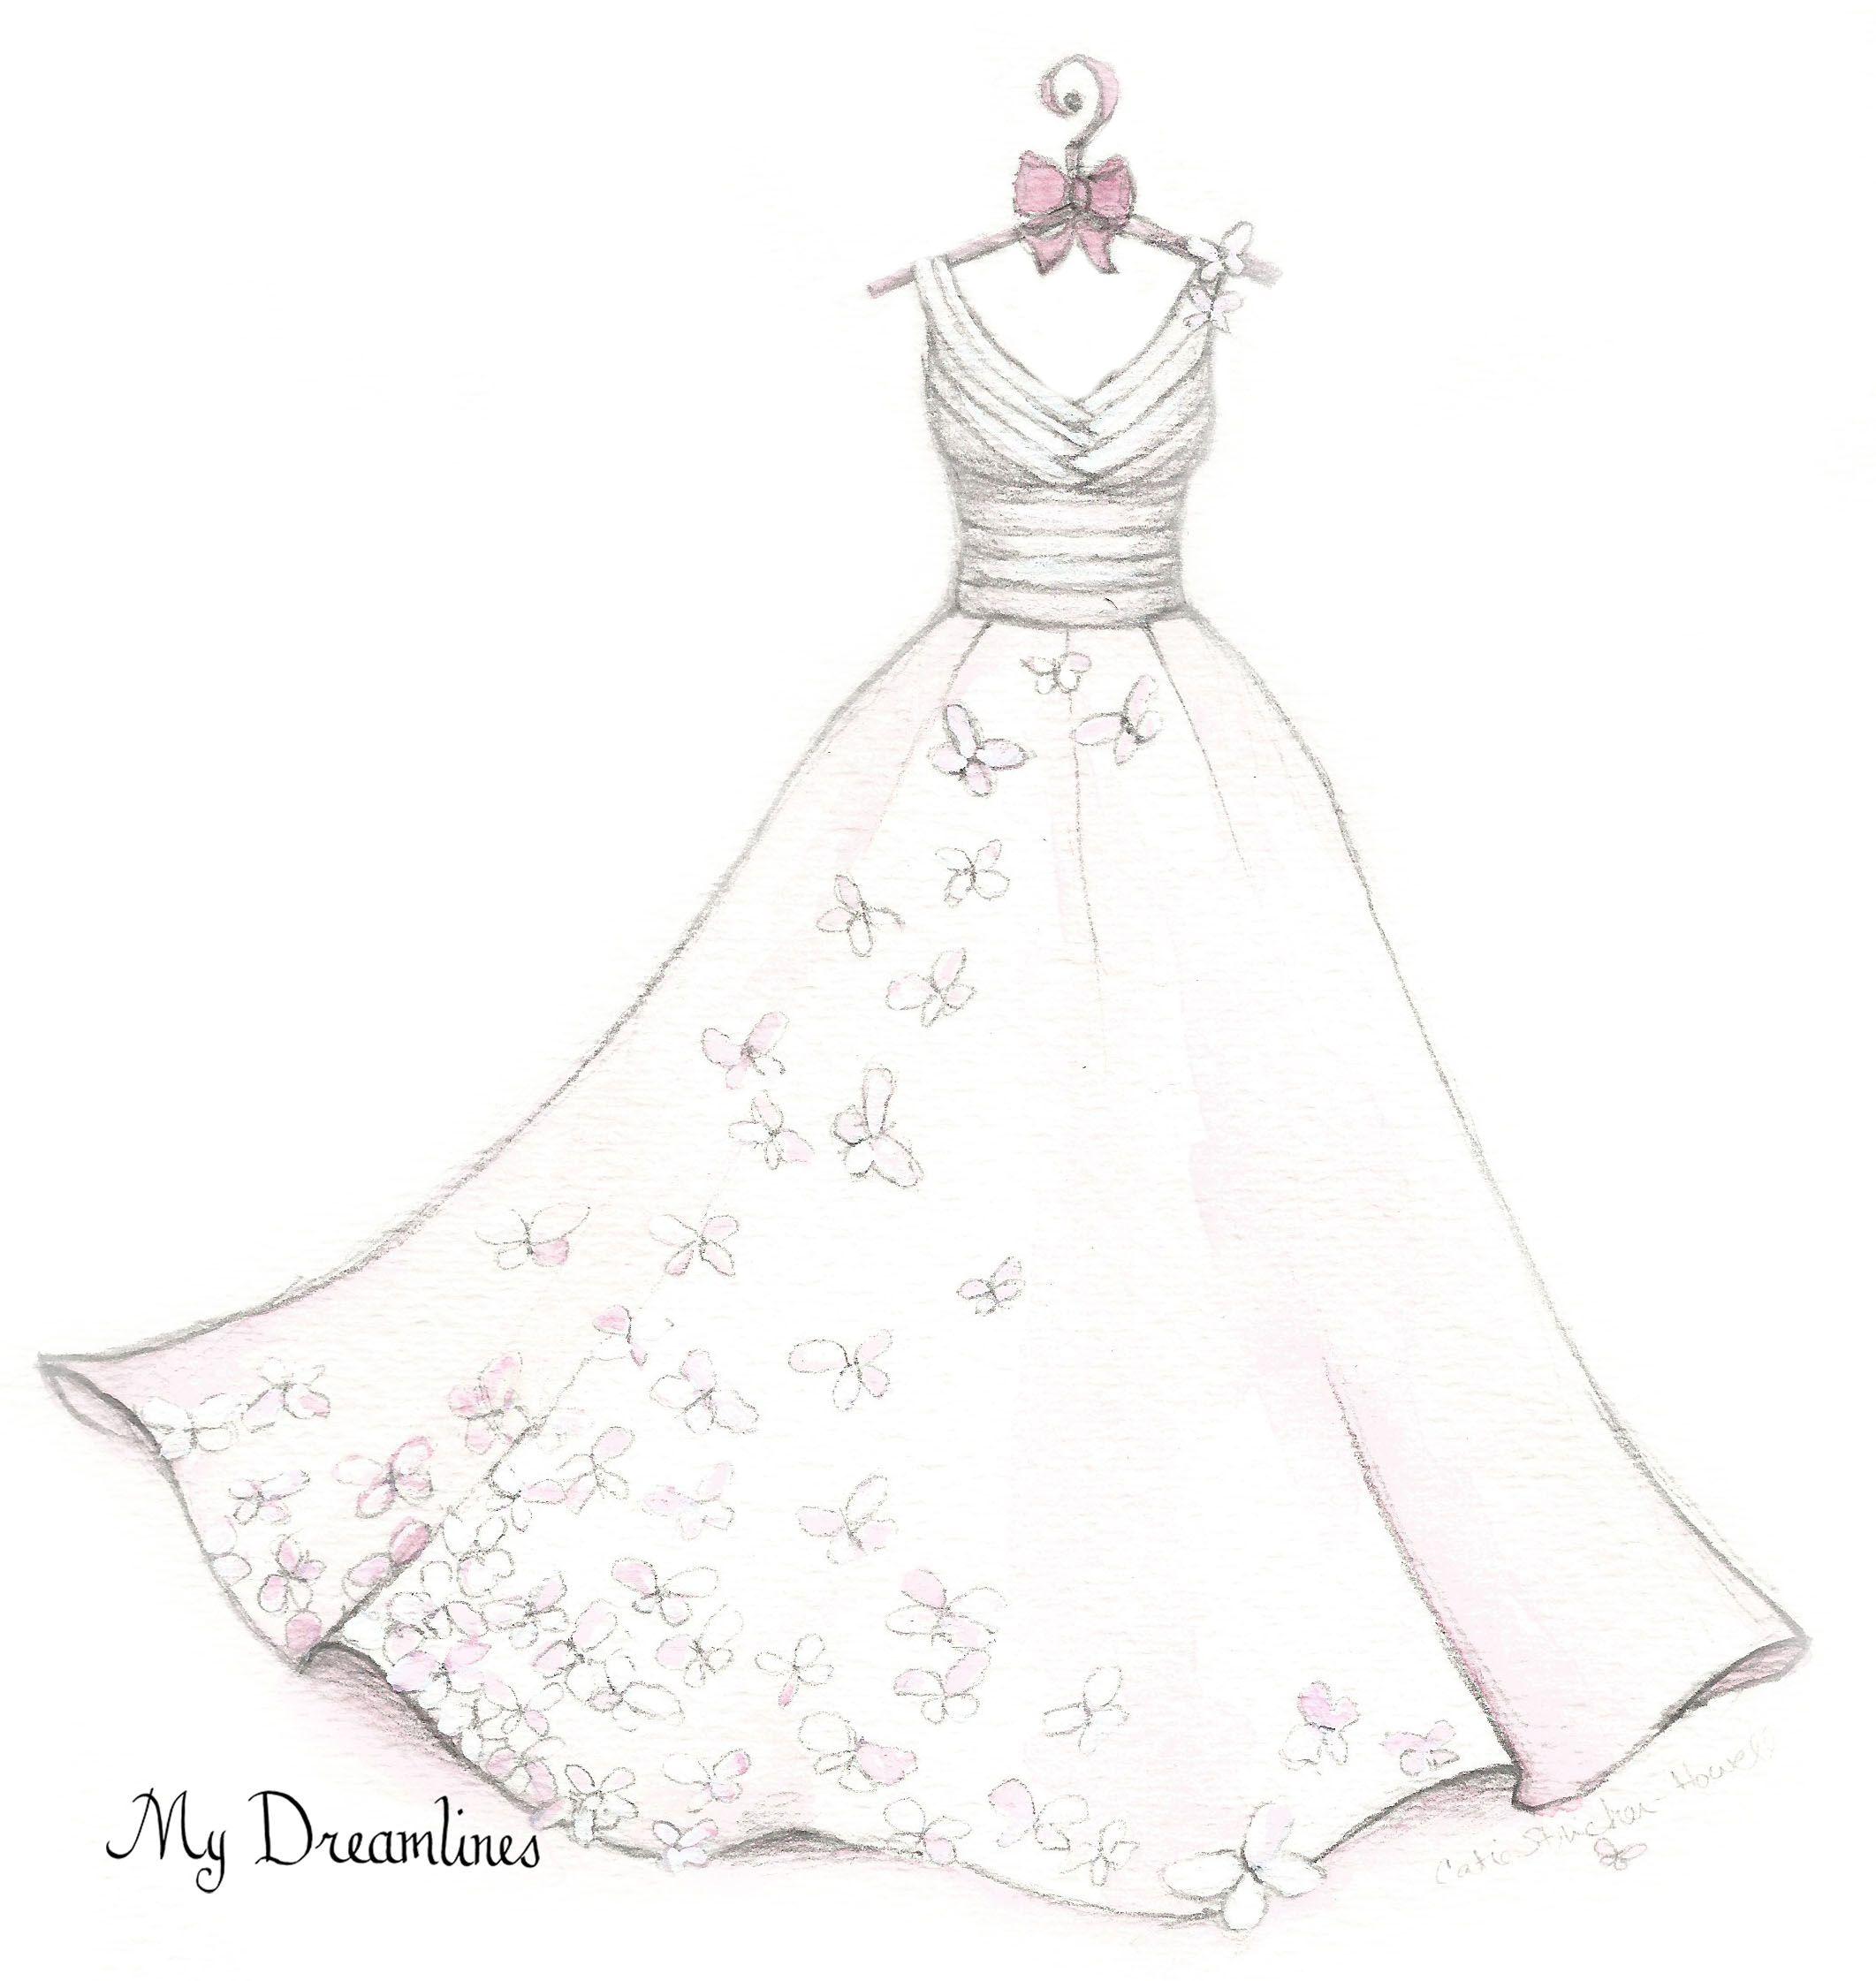 Pin On A Wedding Dress Sketch By Dreamlines